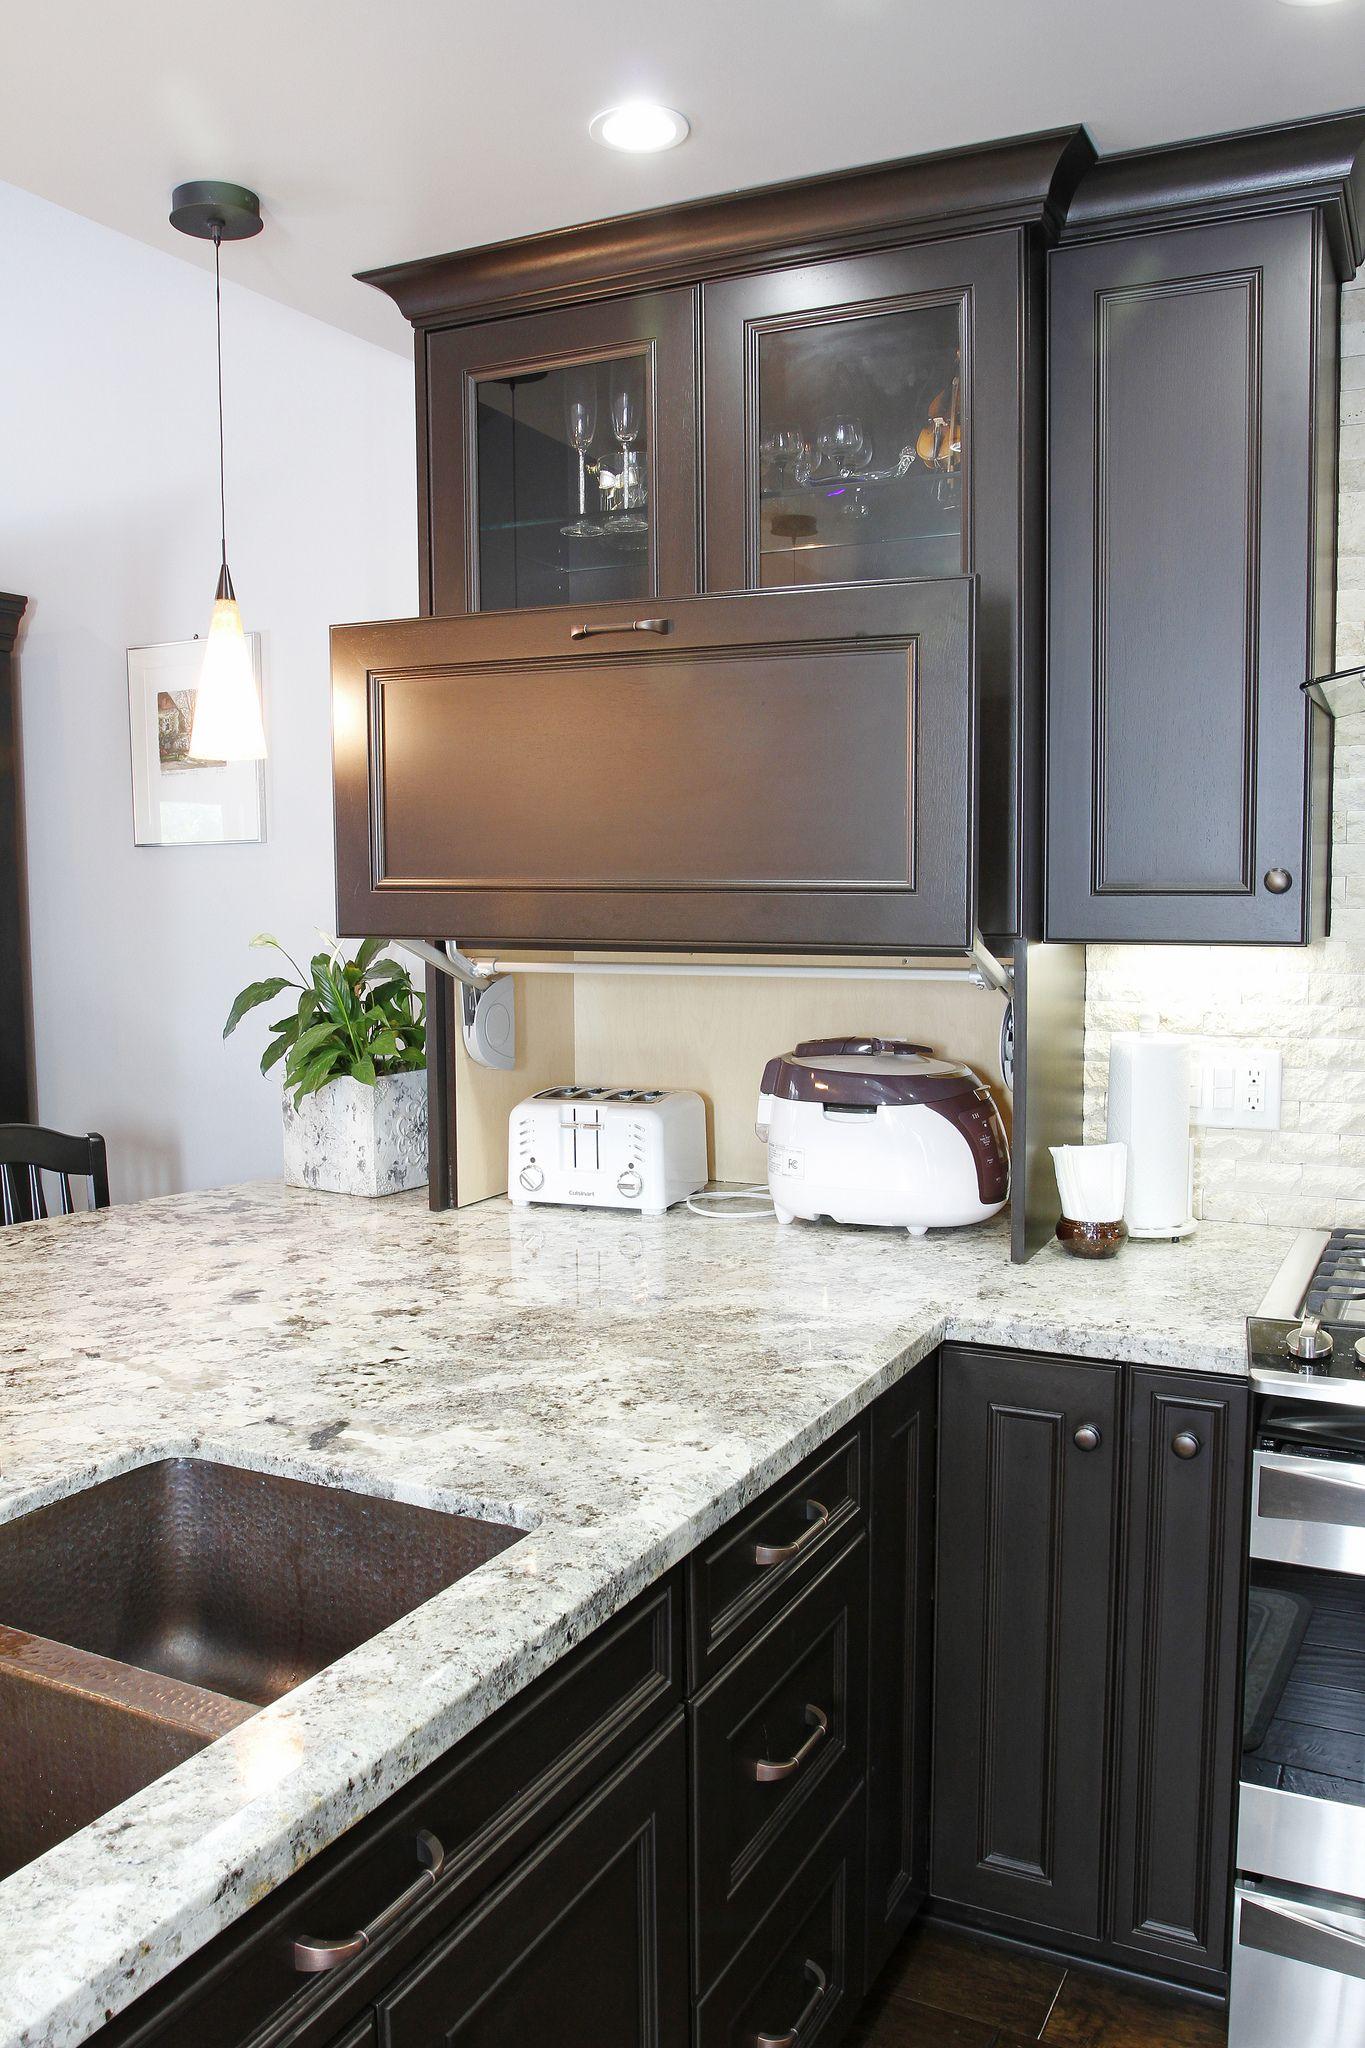 05 cypress kitchen master bathroom remodel kitchen remodel home kitchens kitchen design on kitchen remodel appliances id=69607